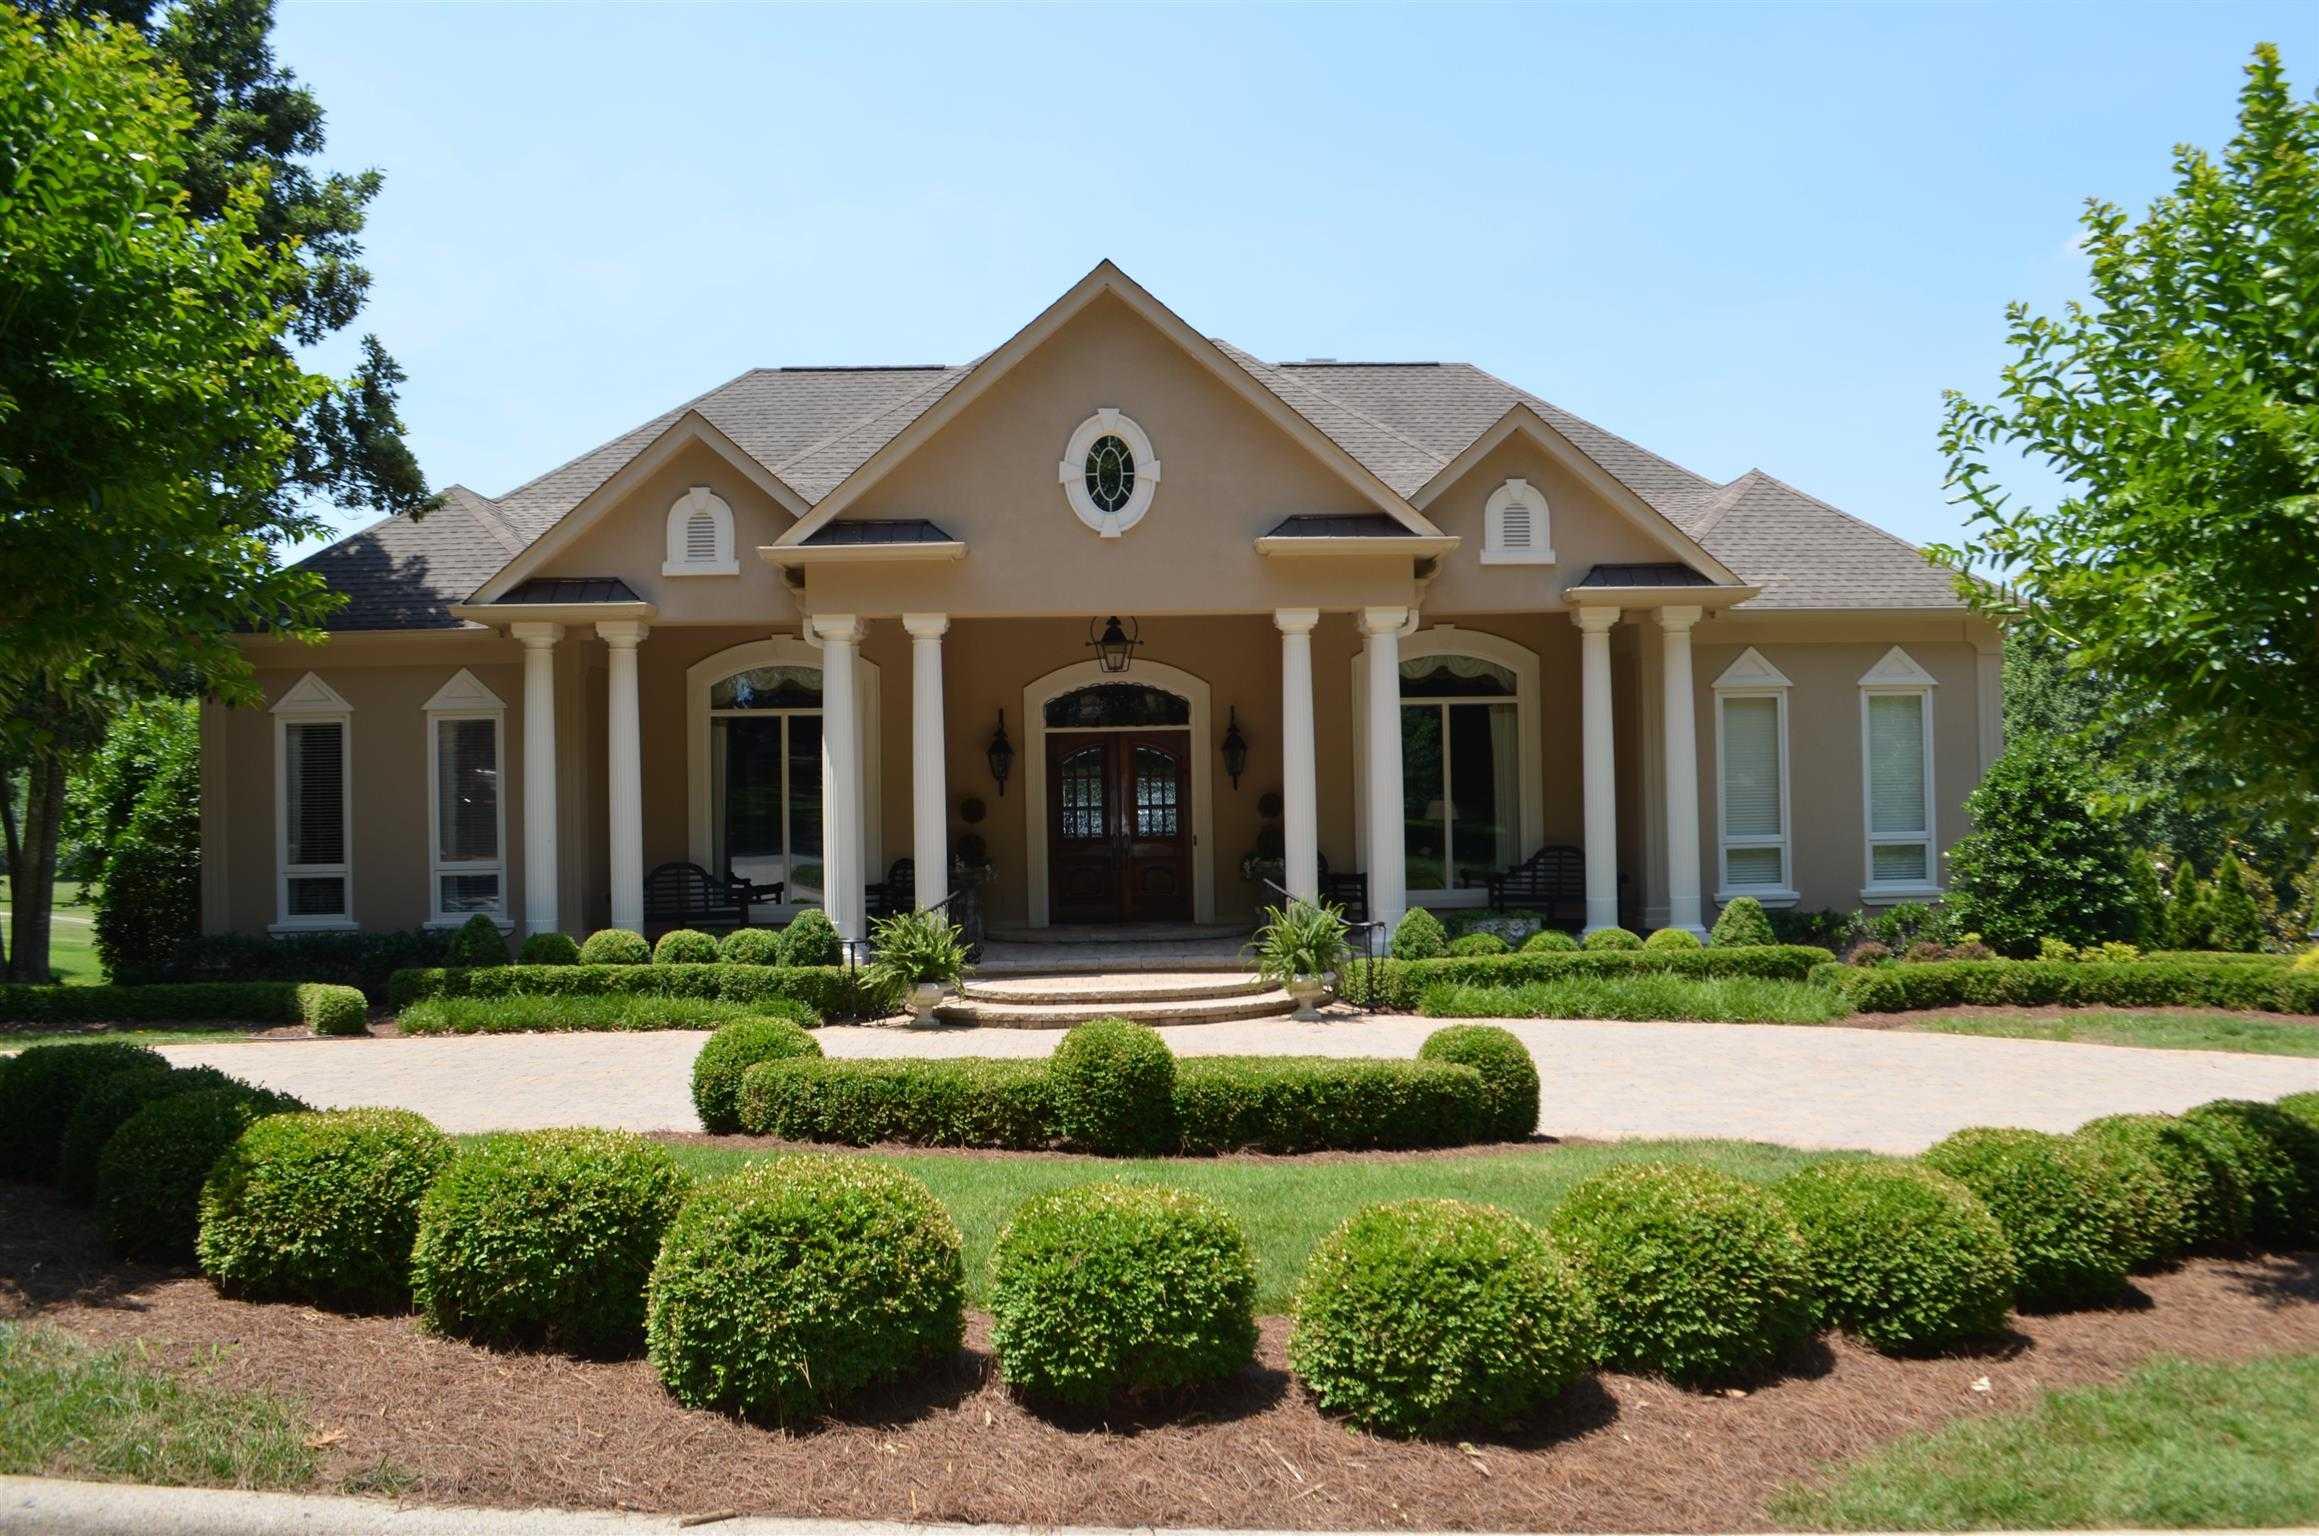 $1,925,000 - 4Br/6Ba -  for Sale in Belle Meade, Clarksville